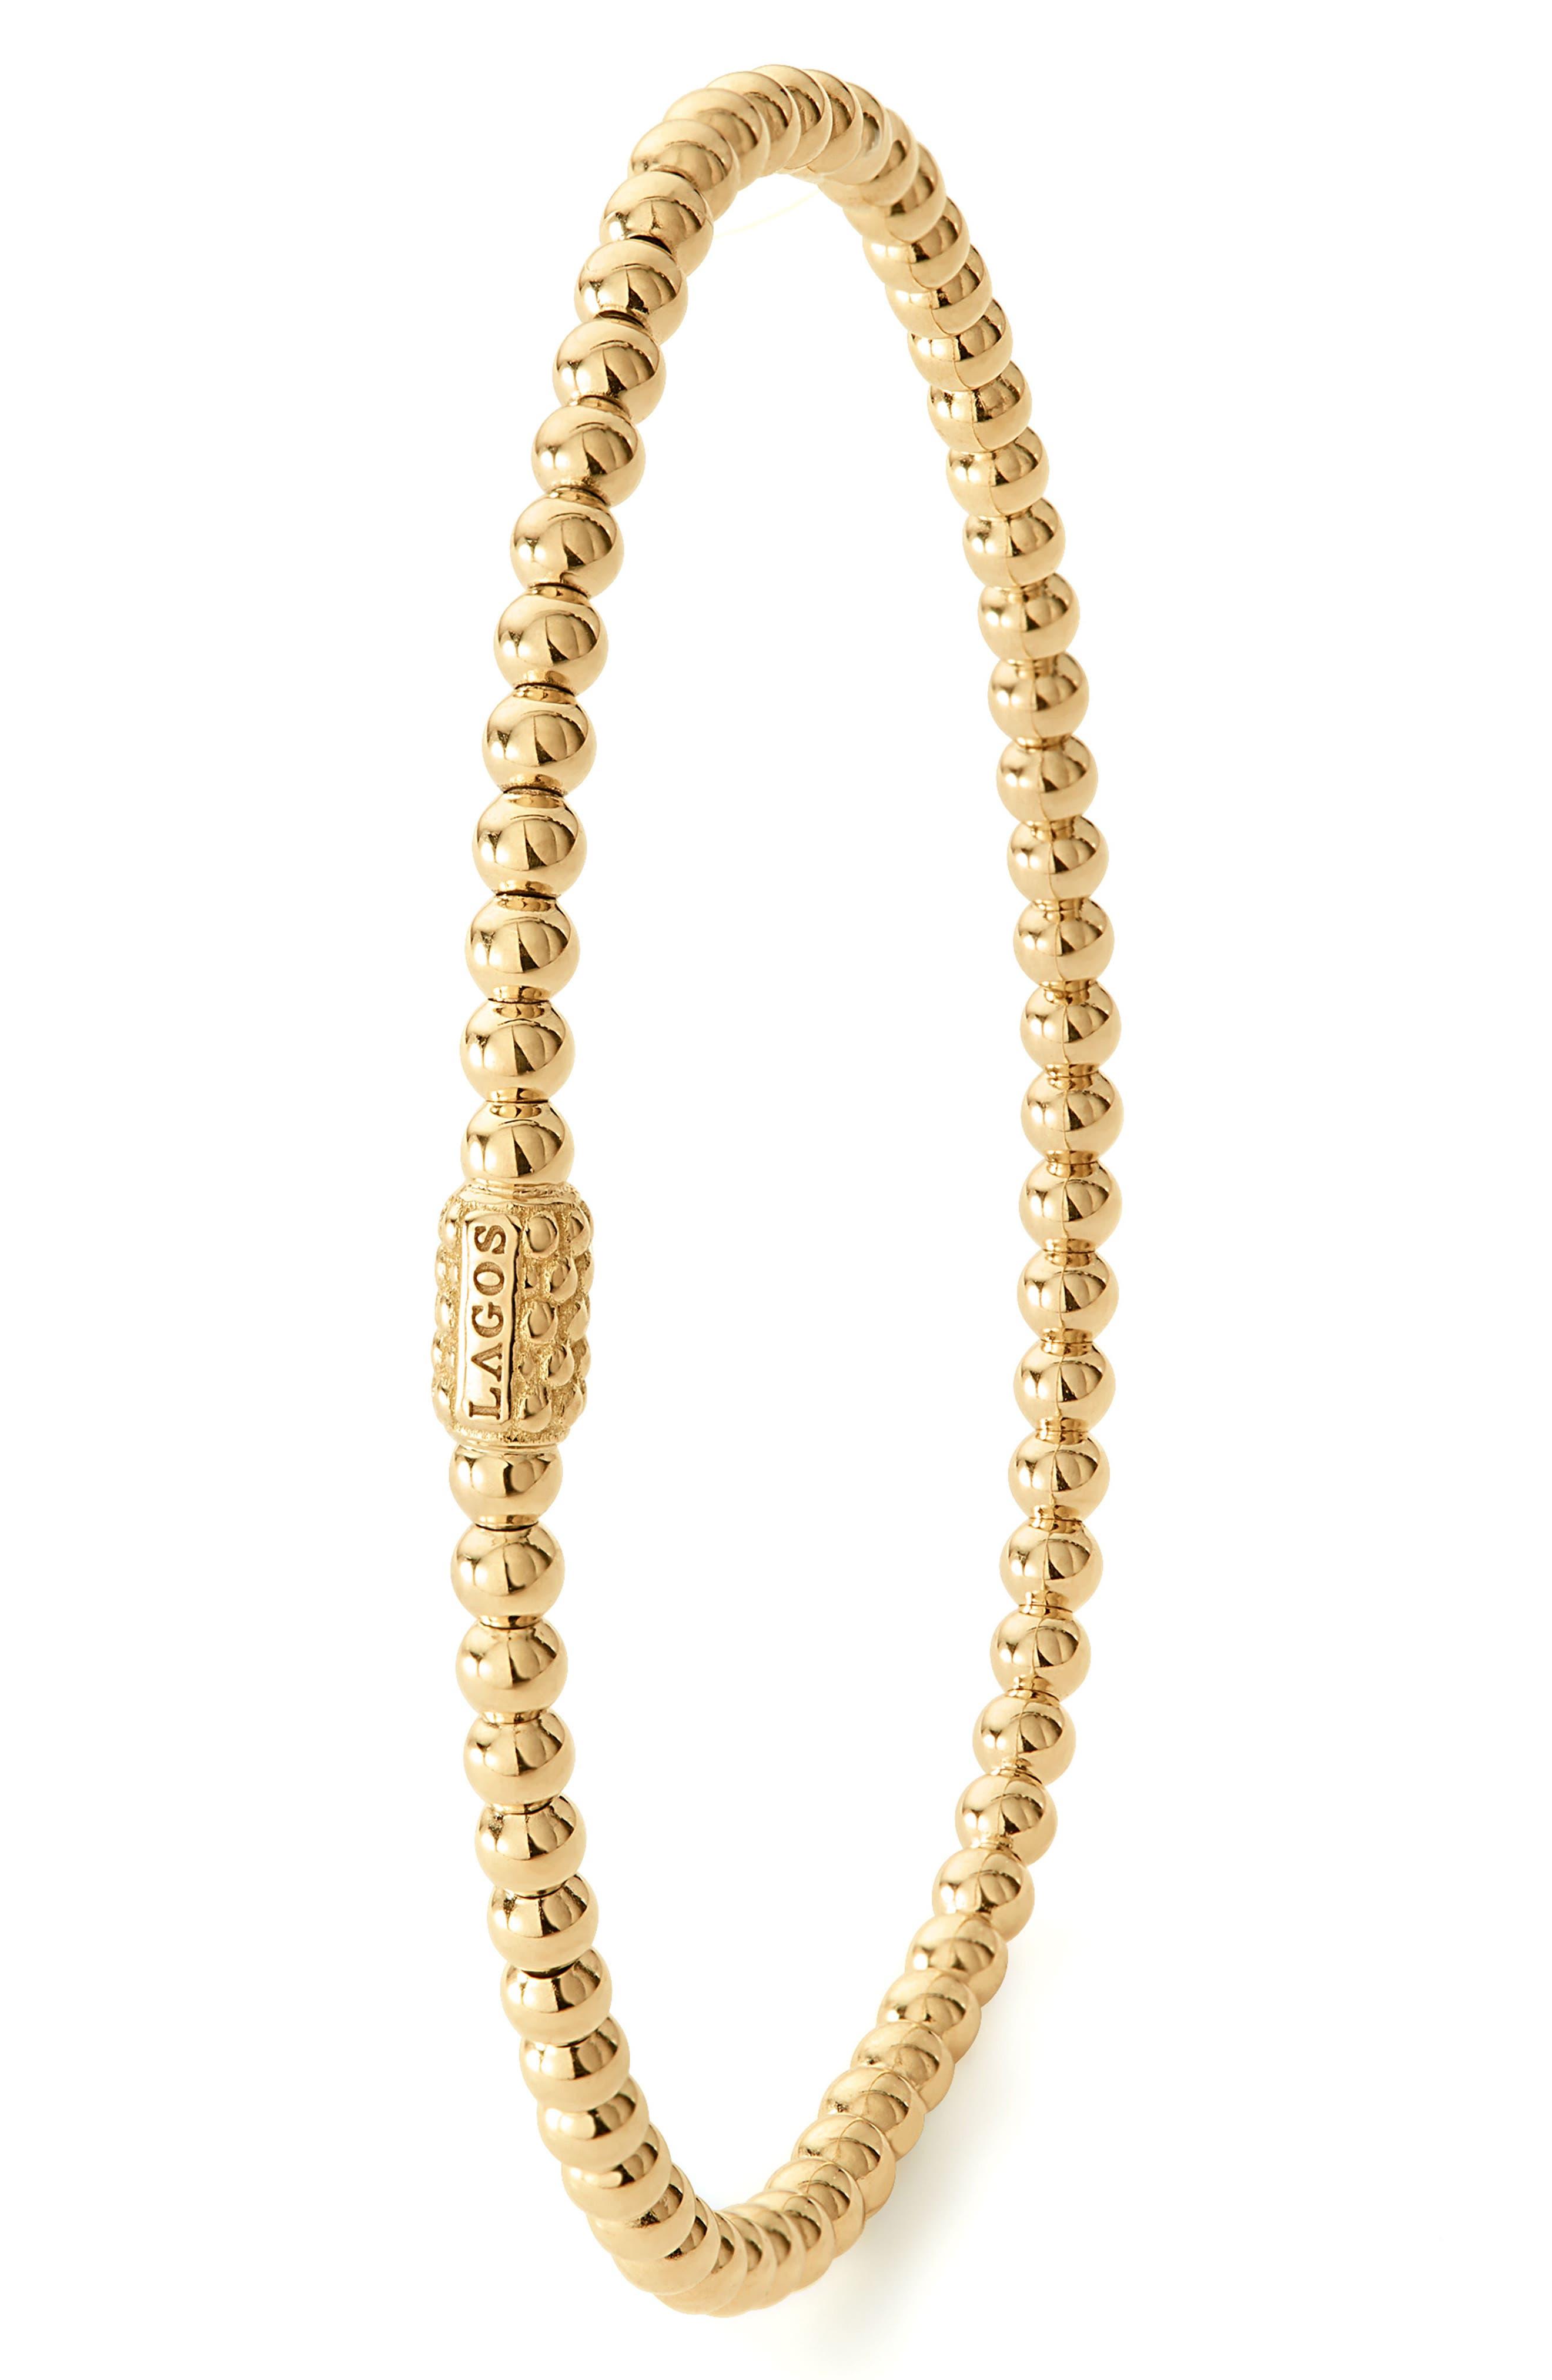 Caviar Gold Ball Stretch Bracelet,                             Alternate thumbnail 3, color,                             Gold